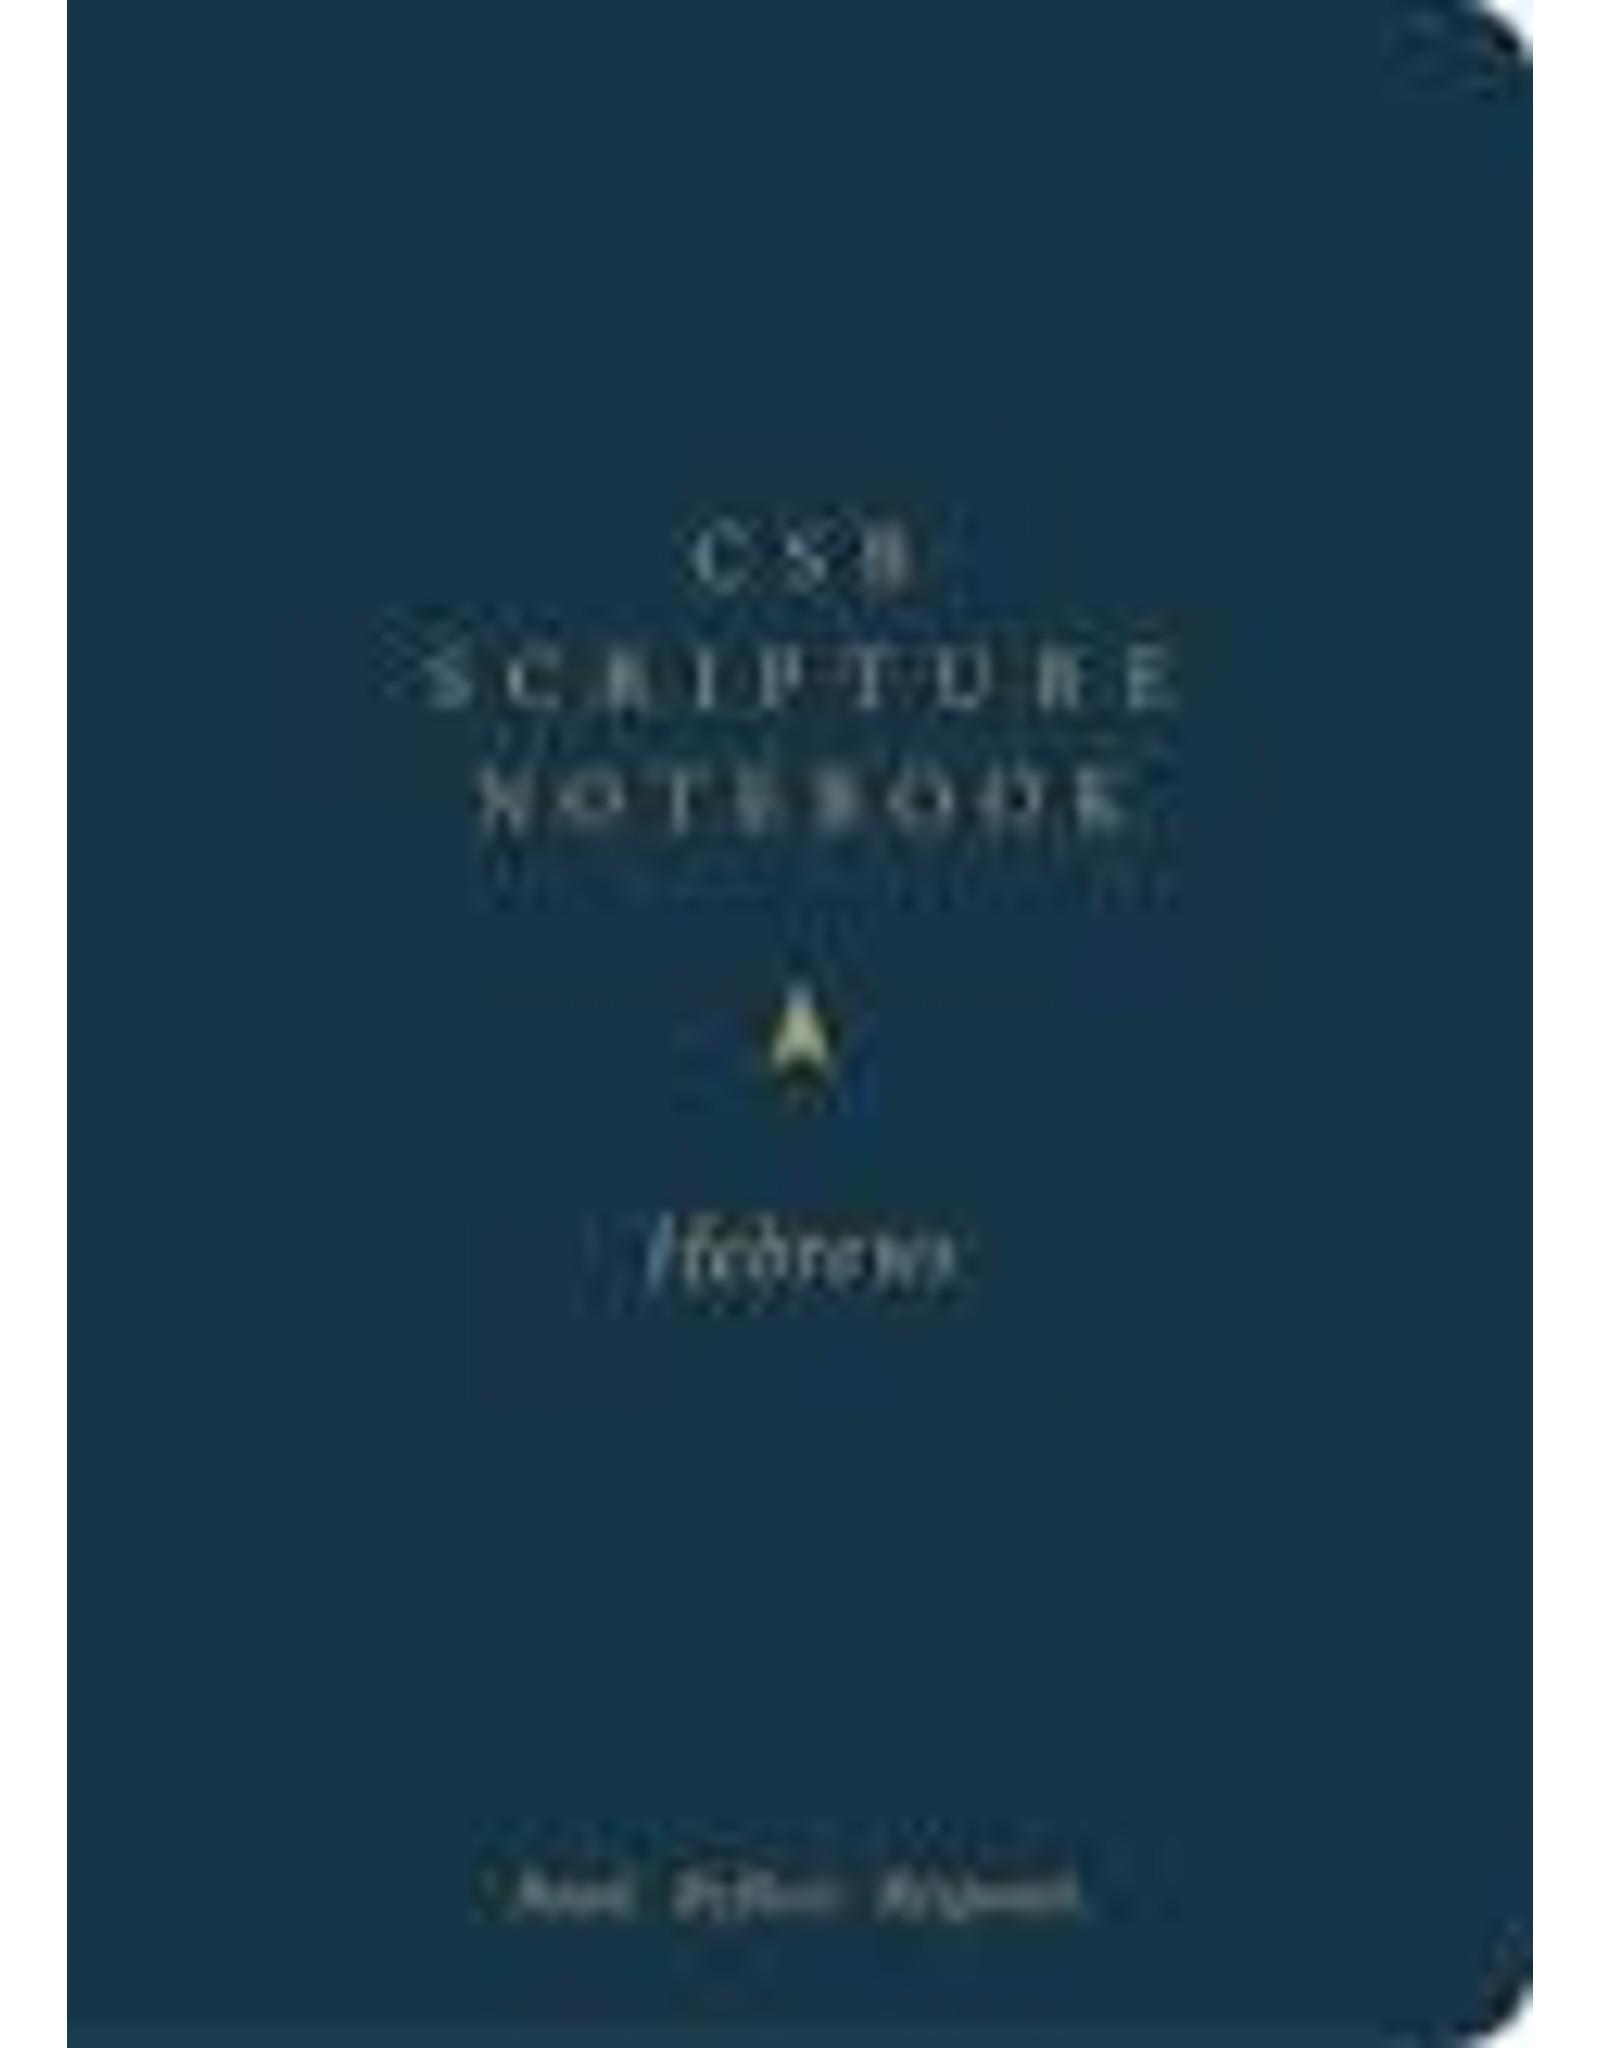 Holman CSB Scripture Notebook - Hebrews